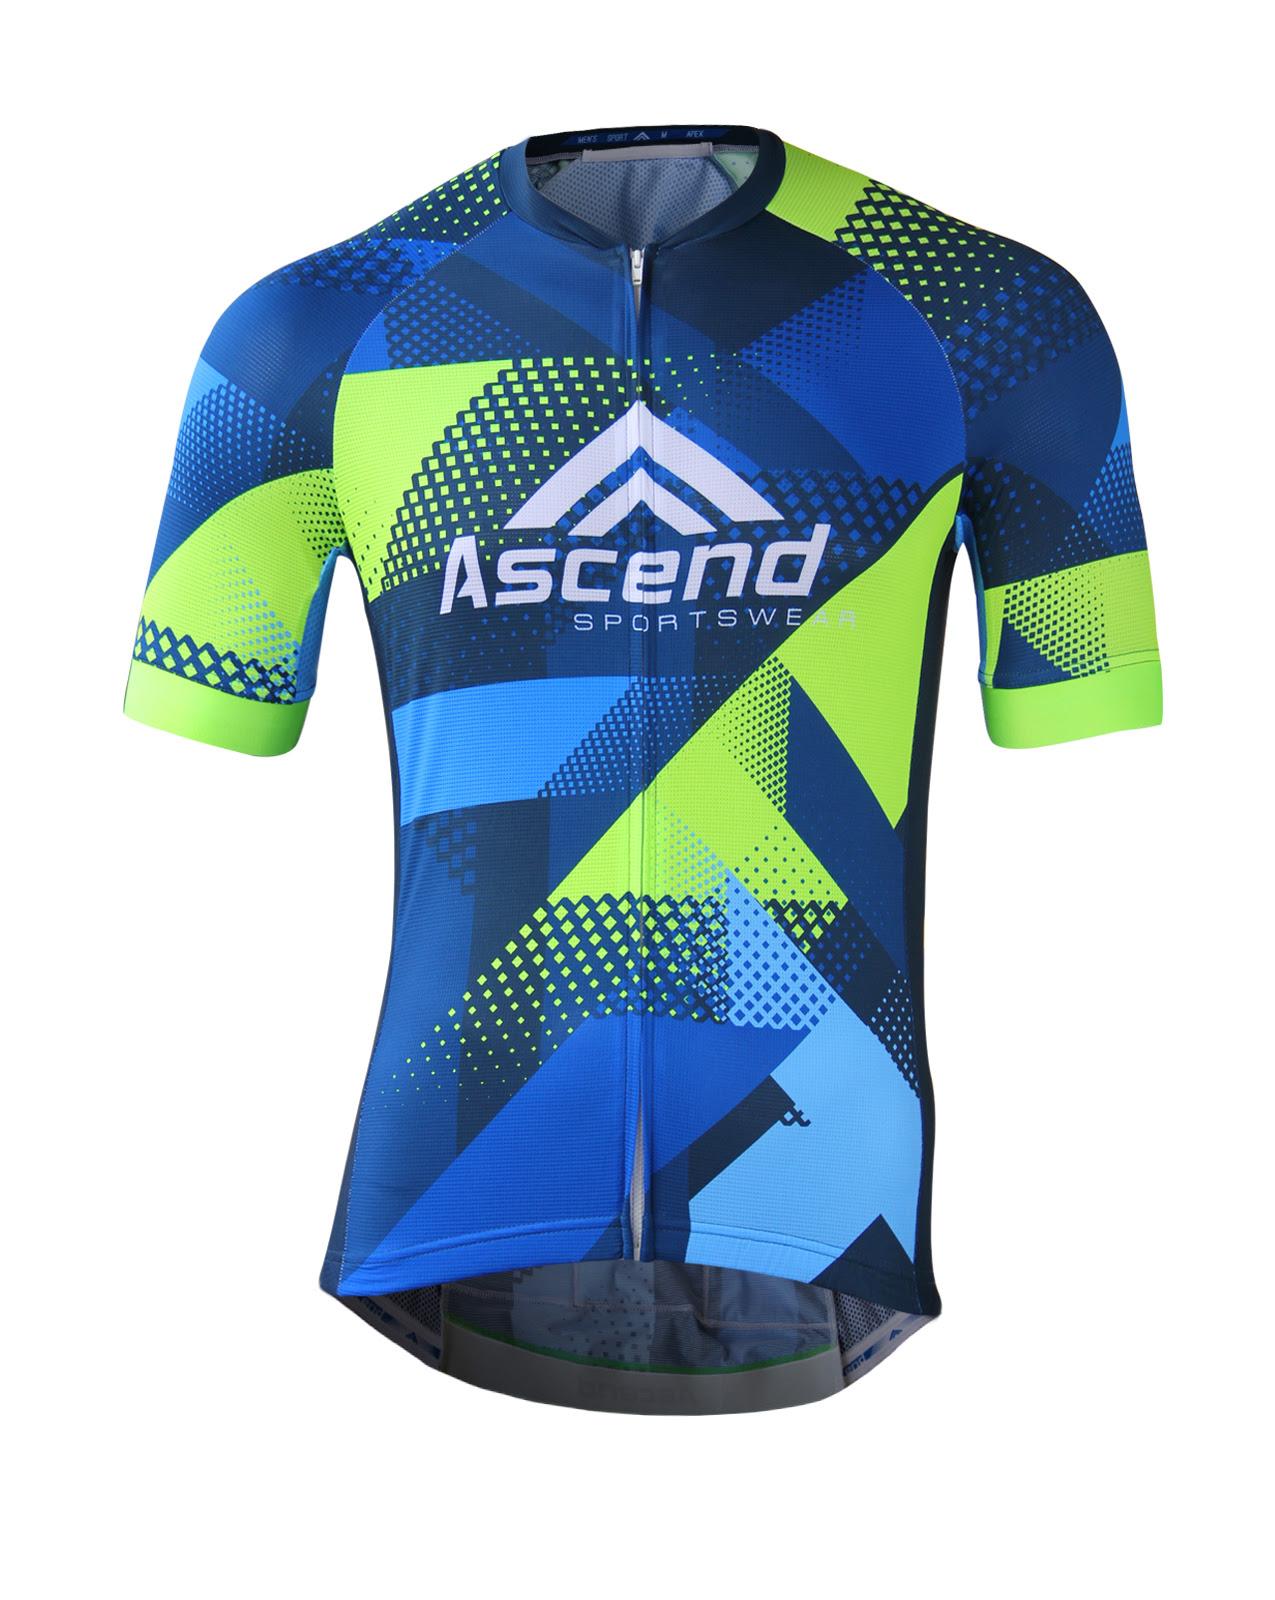 APEX Custom Cycling Jersey  Ascend Sportswear